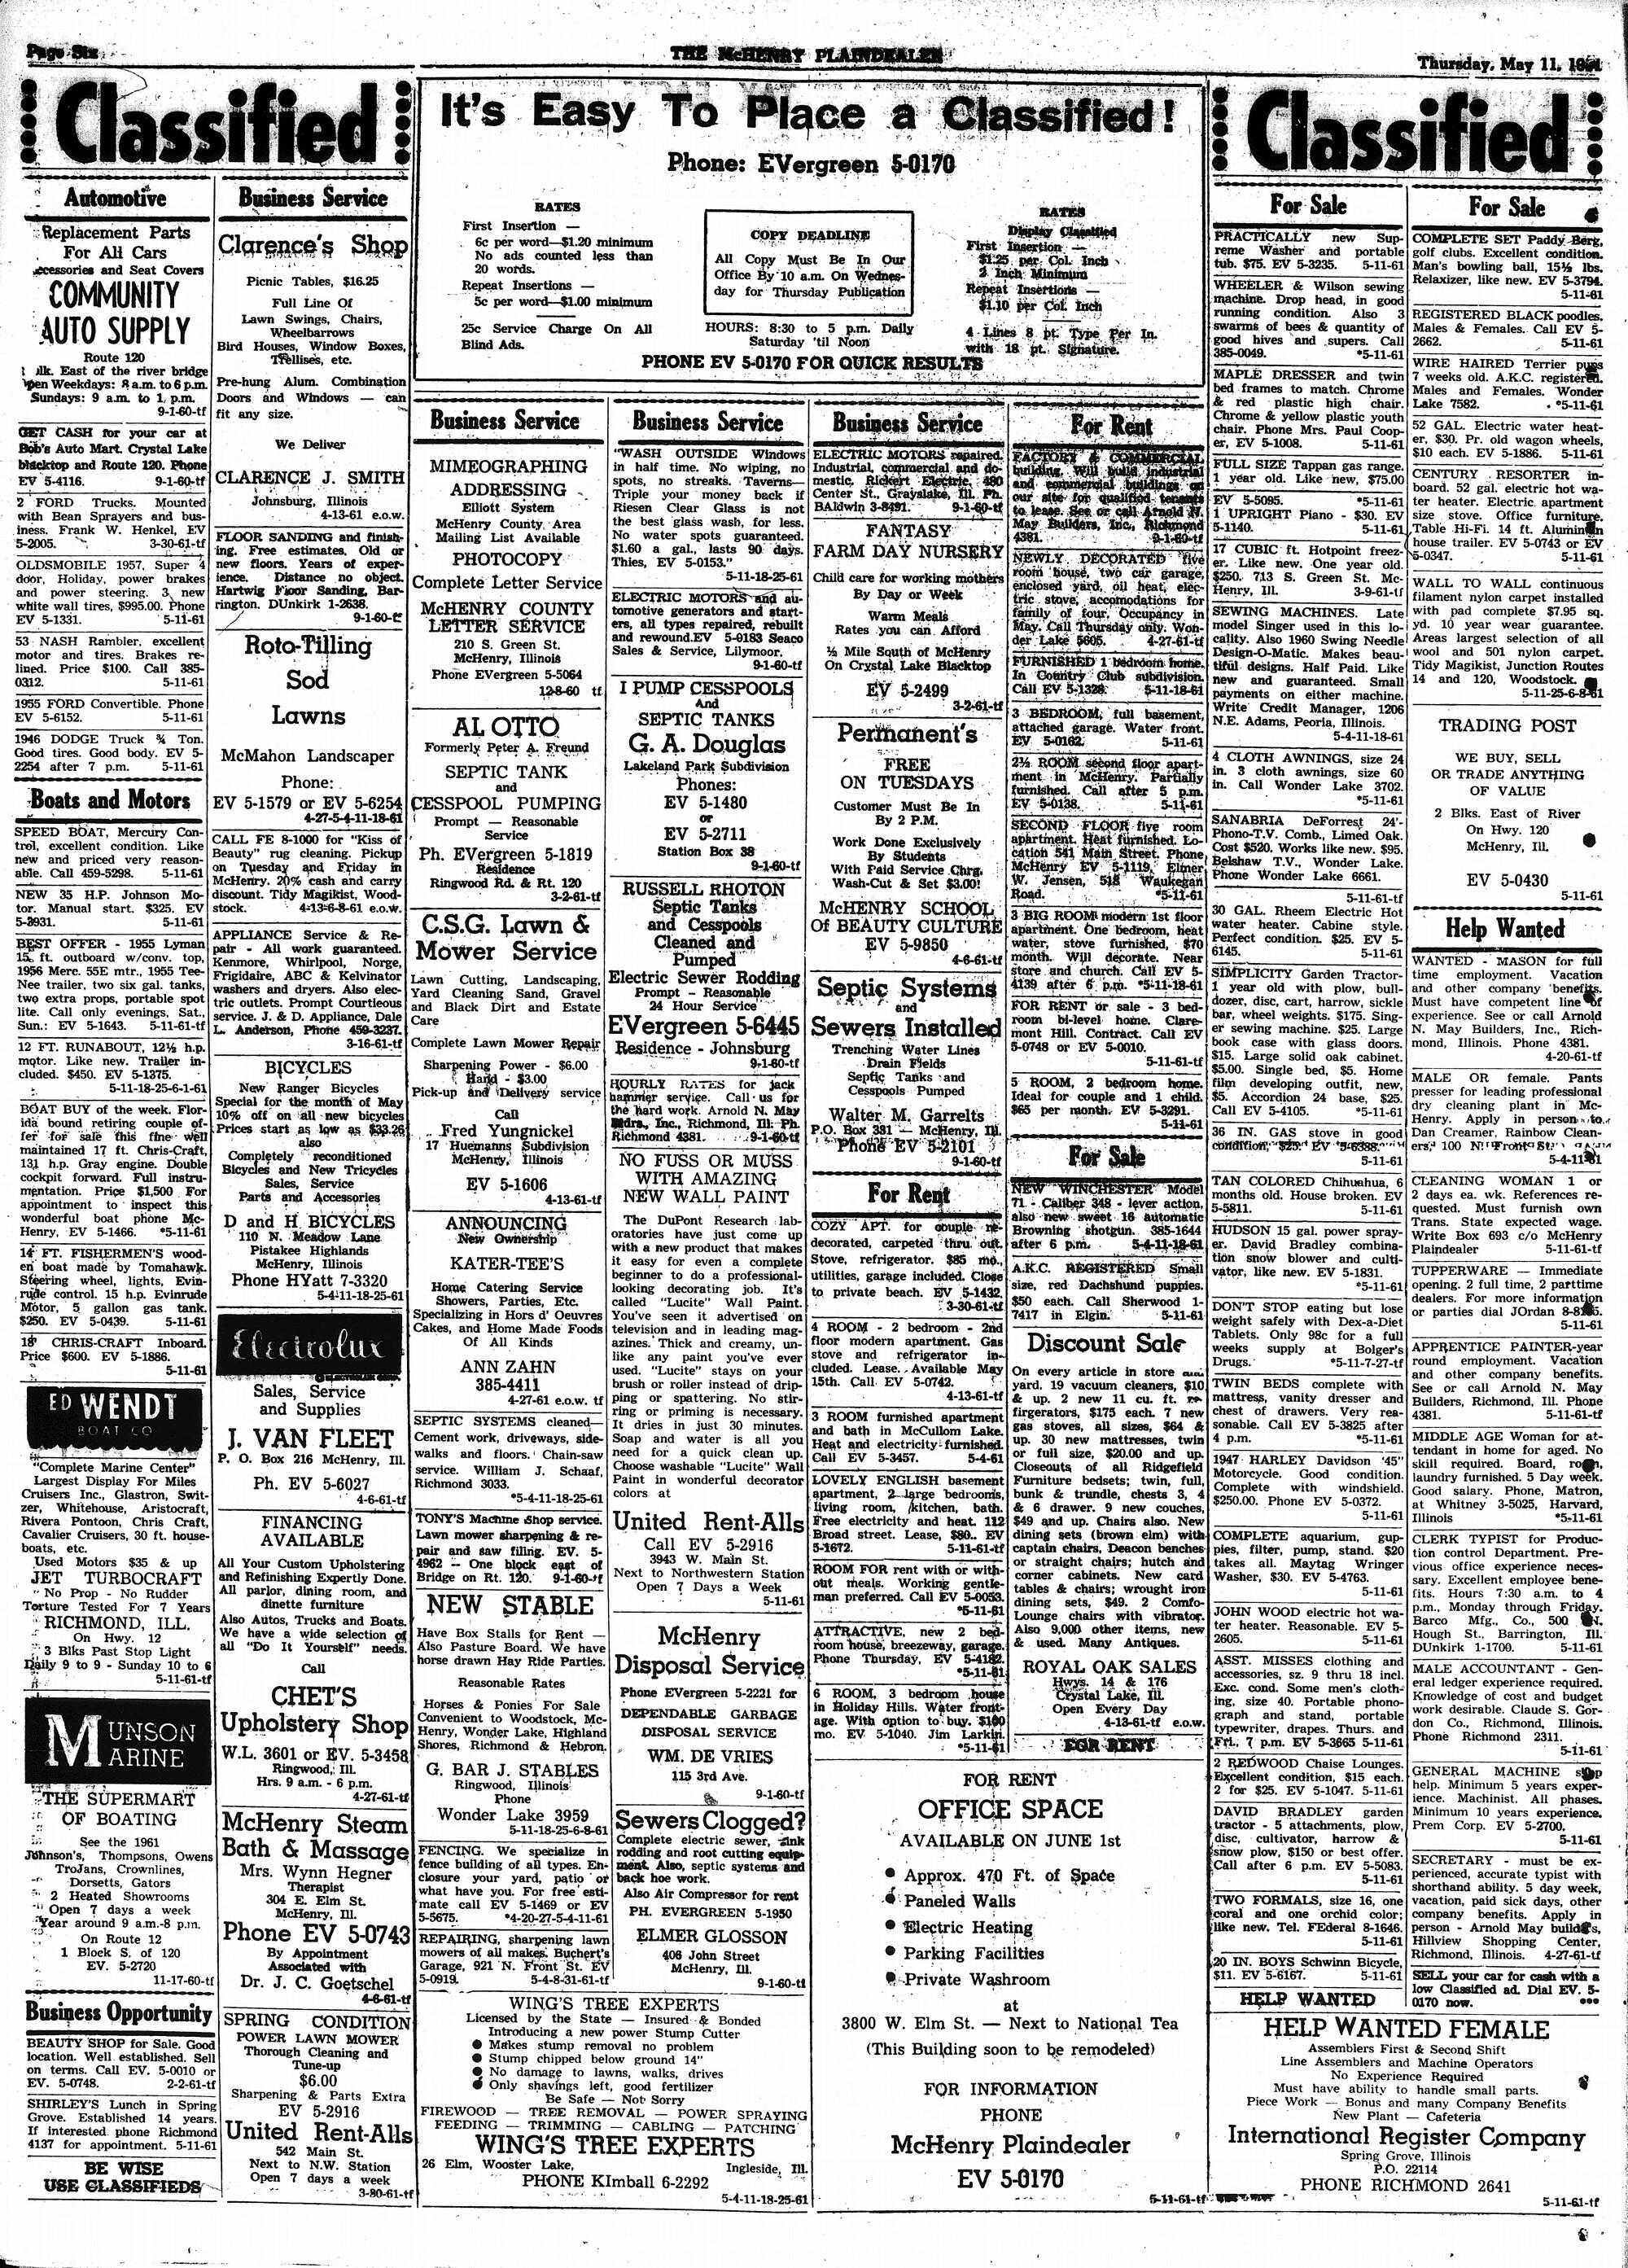 McHenry Plaindealer (McHenry, IL), 11 May 1961